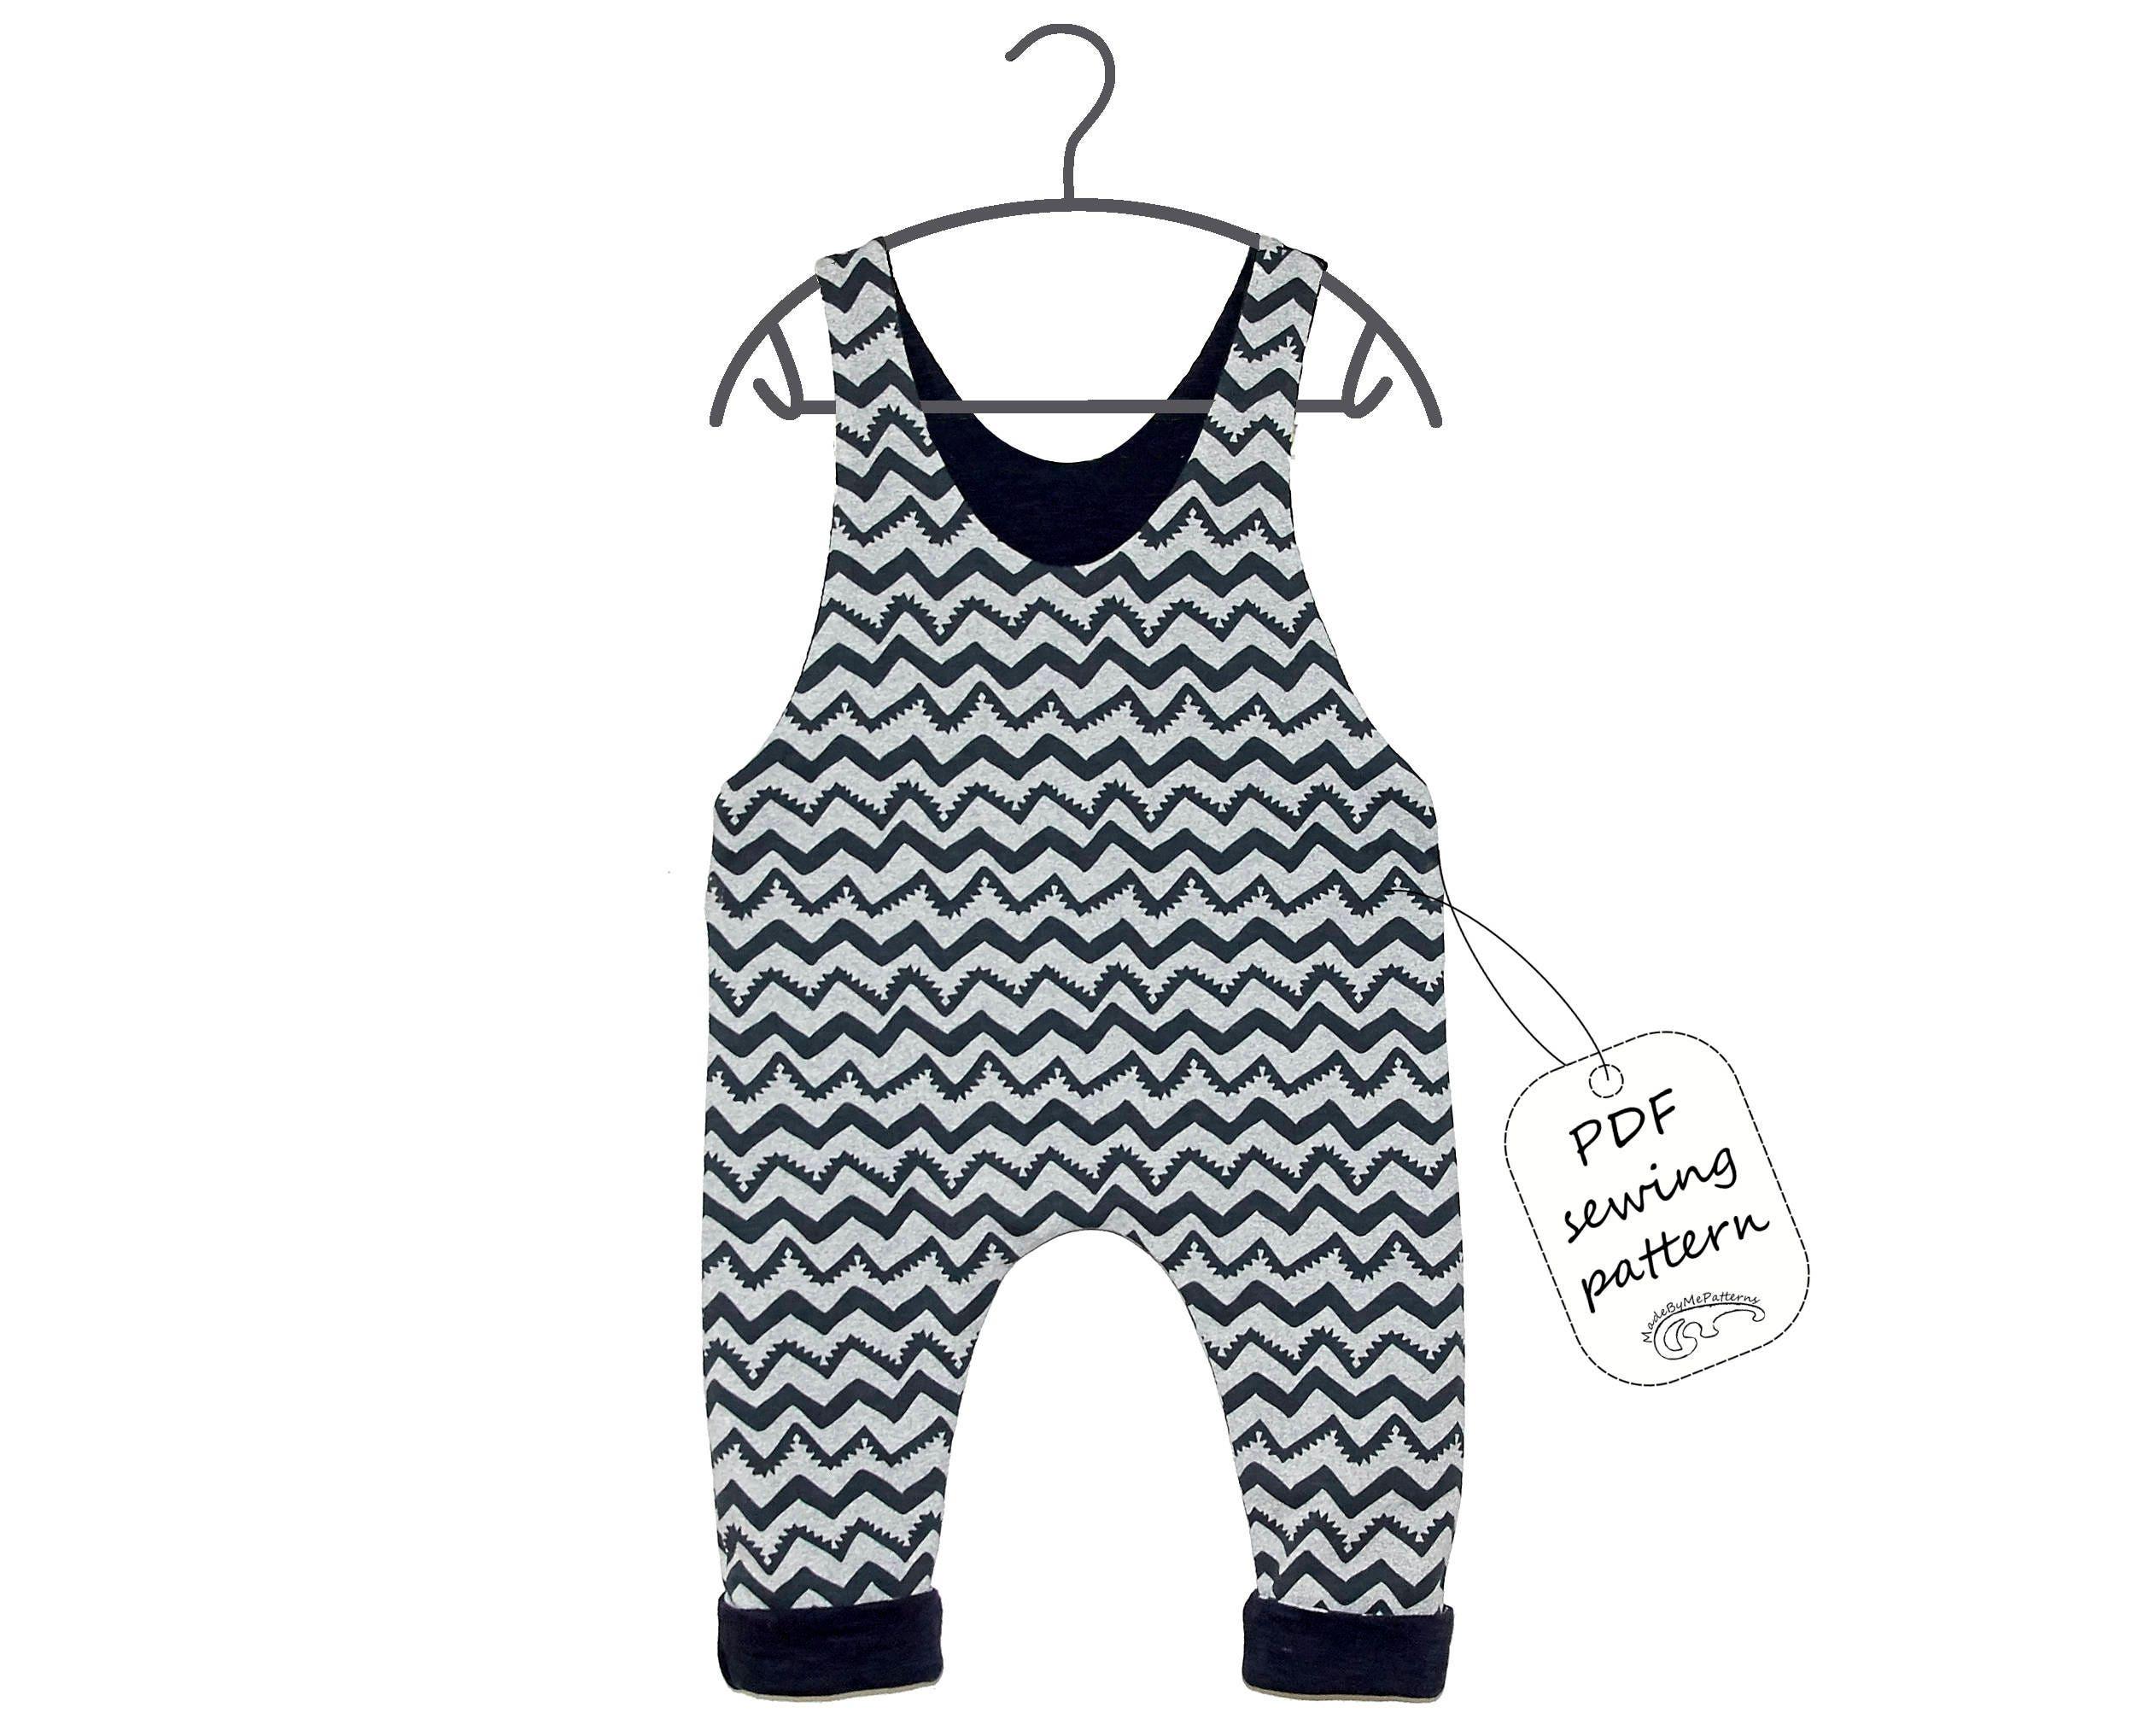 Baby romper pattern PDF, kids romper pattern PDF, sewing patterns ...